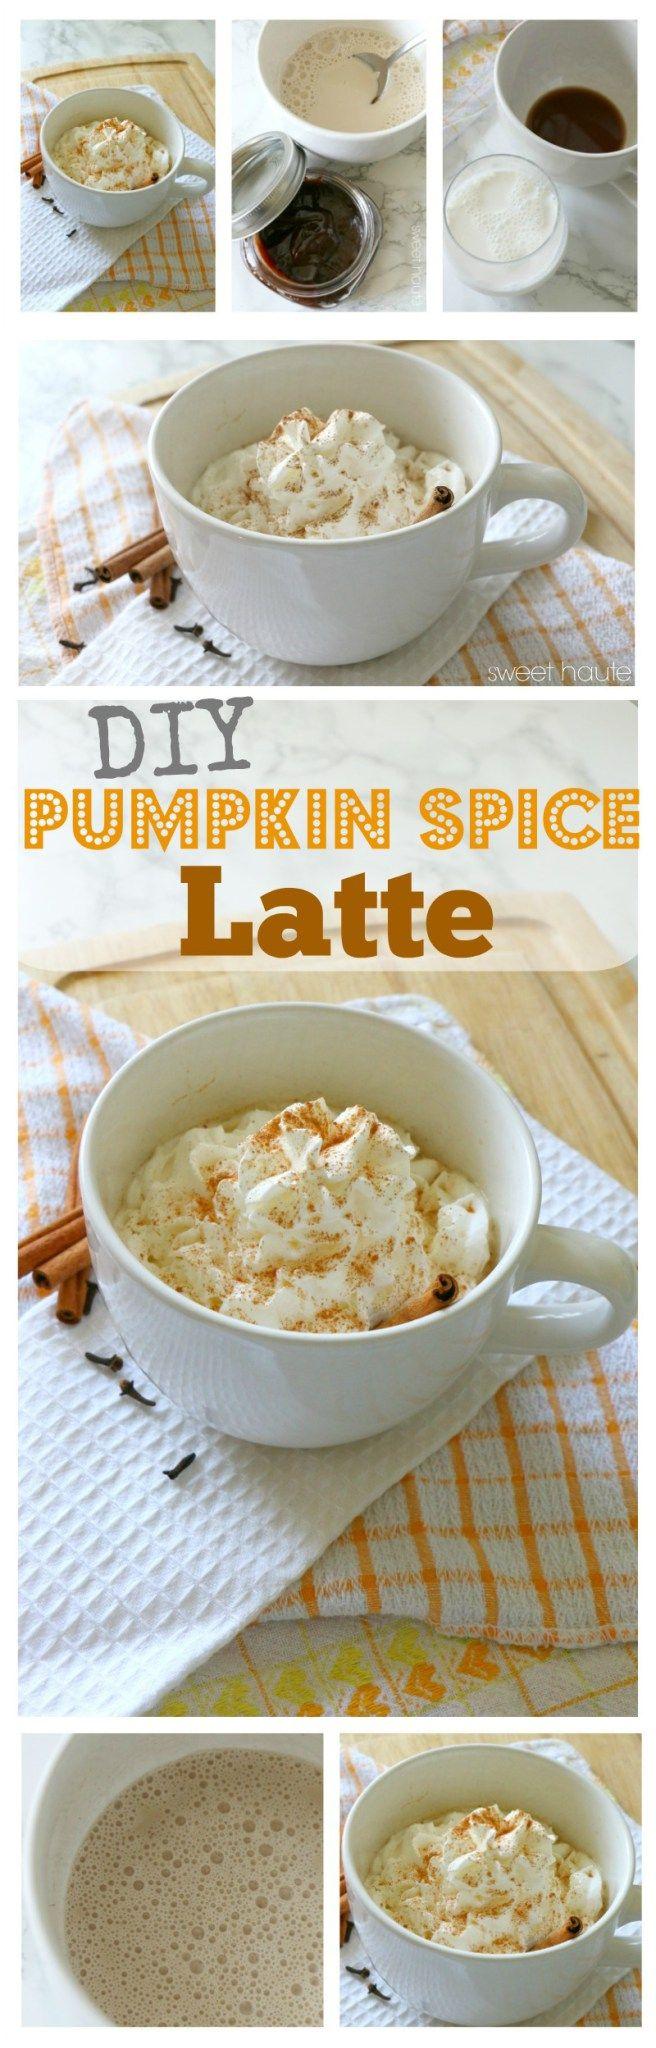 Homemade Pumpkin Spice Latte Recipe Tutorial